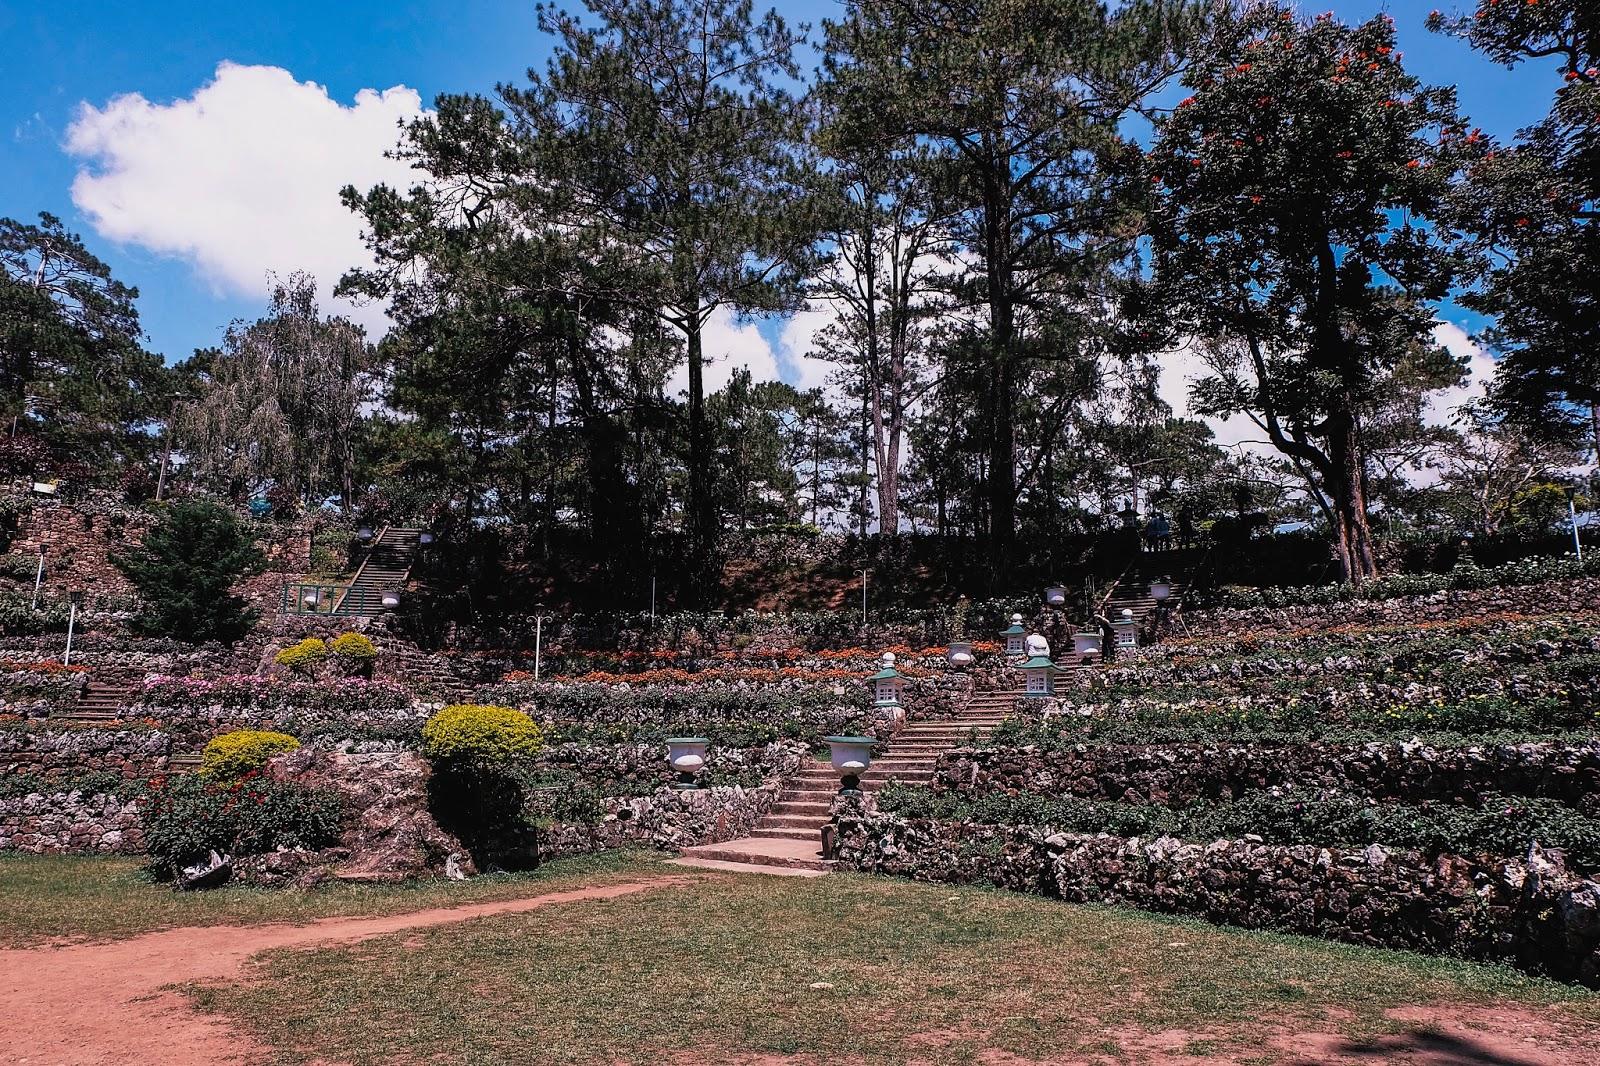 Baguio 2017 」 Lourdes Grotto, Diplomat Hotel and Camp John